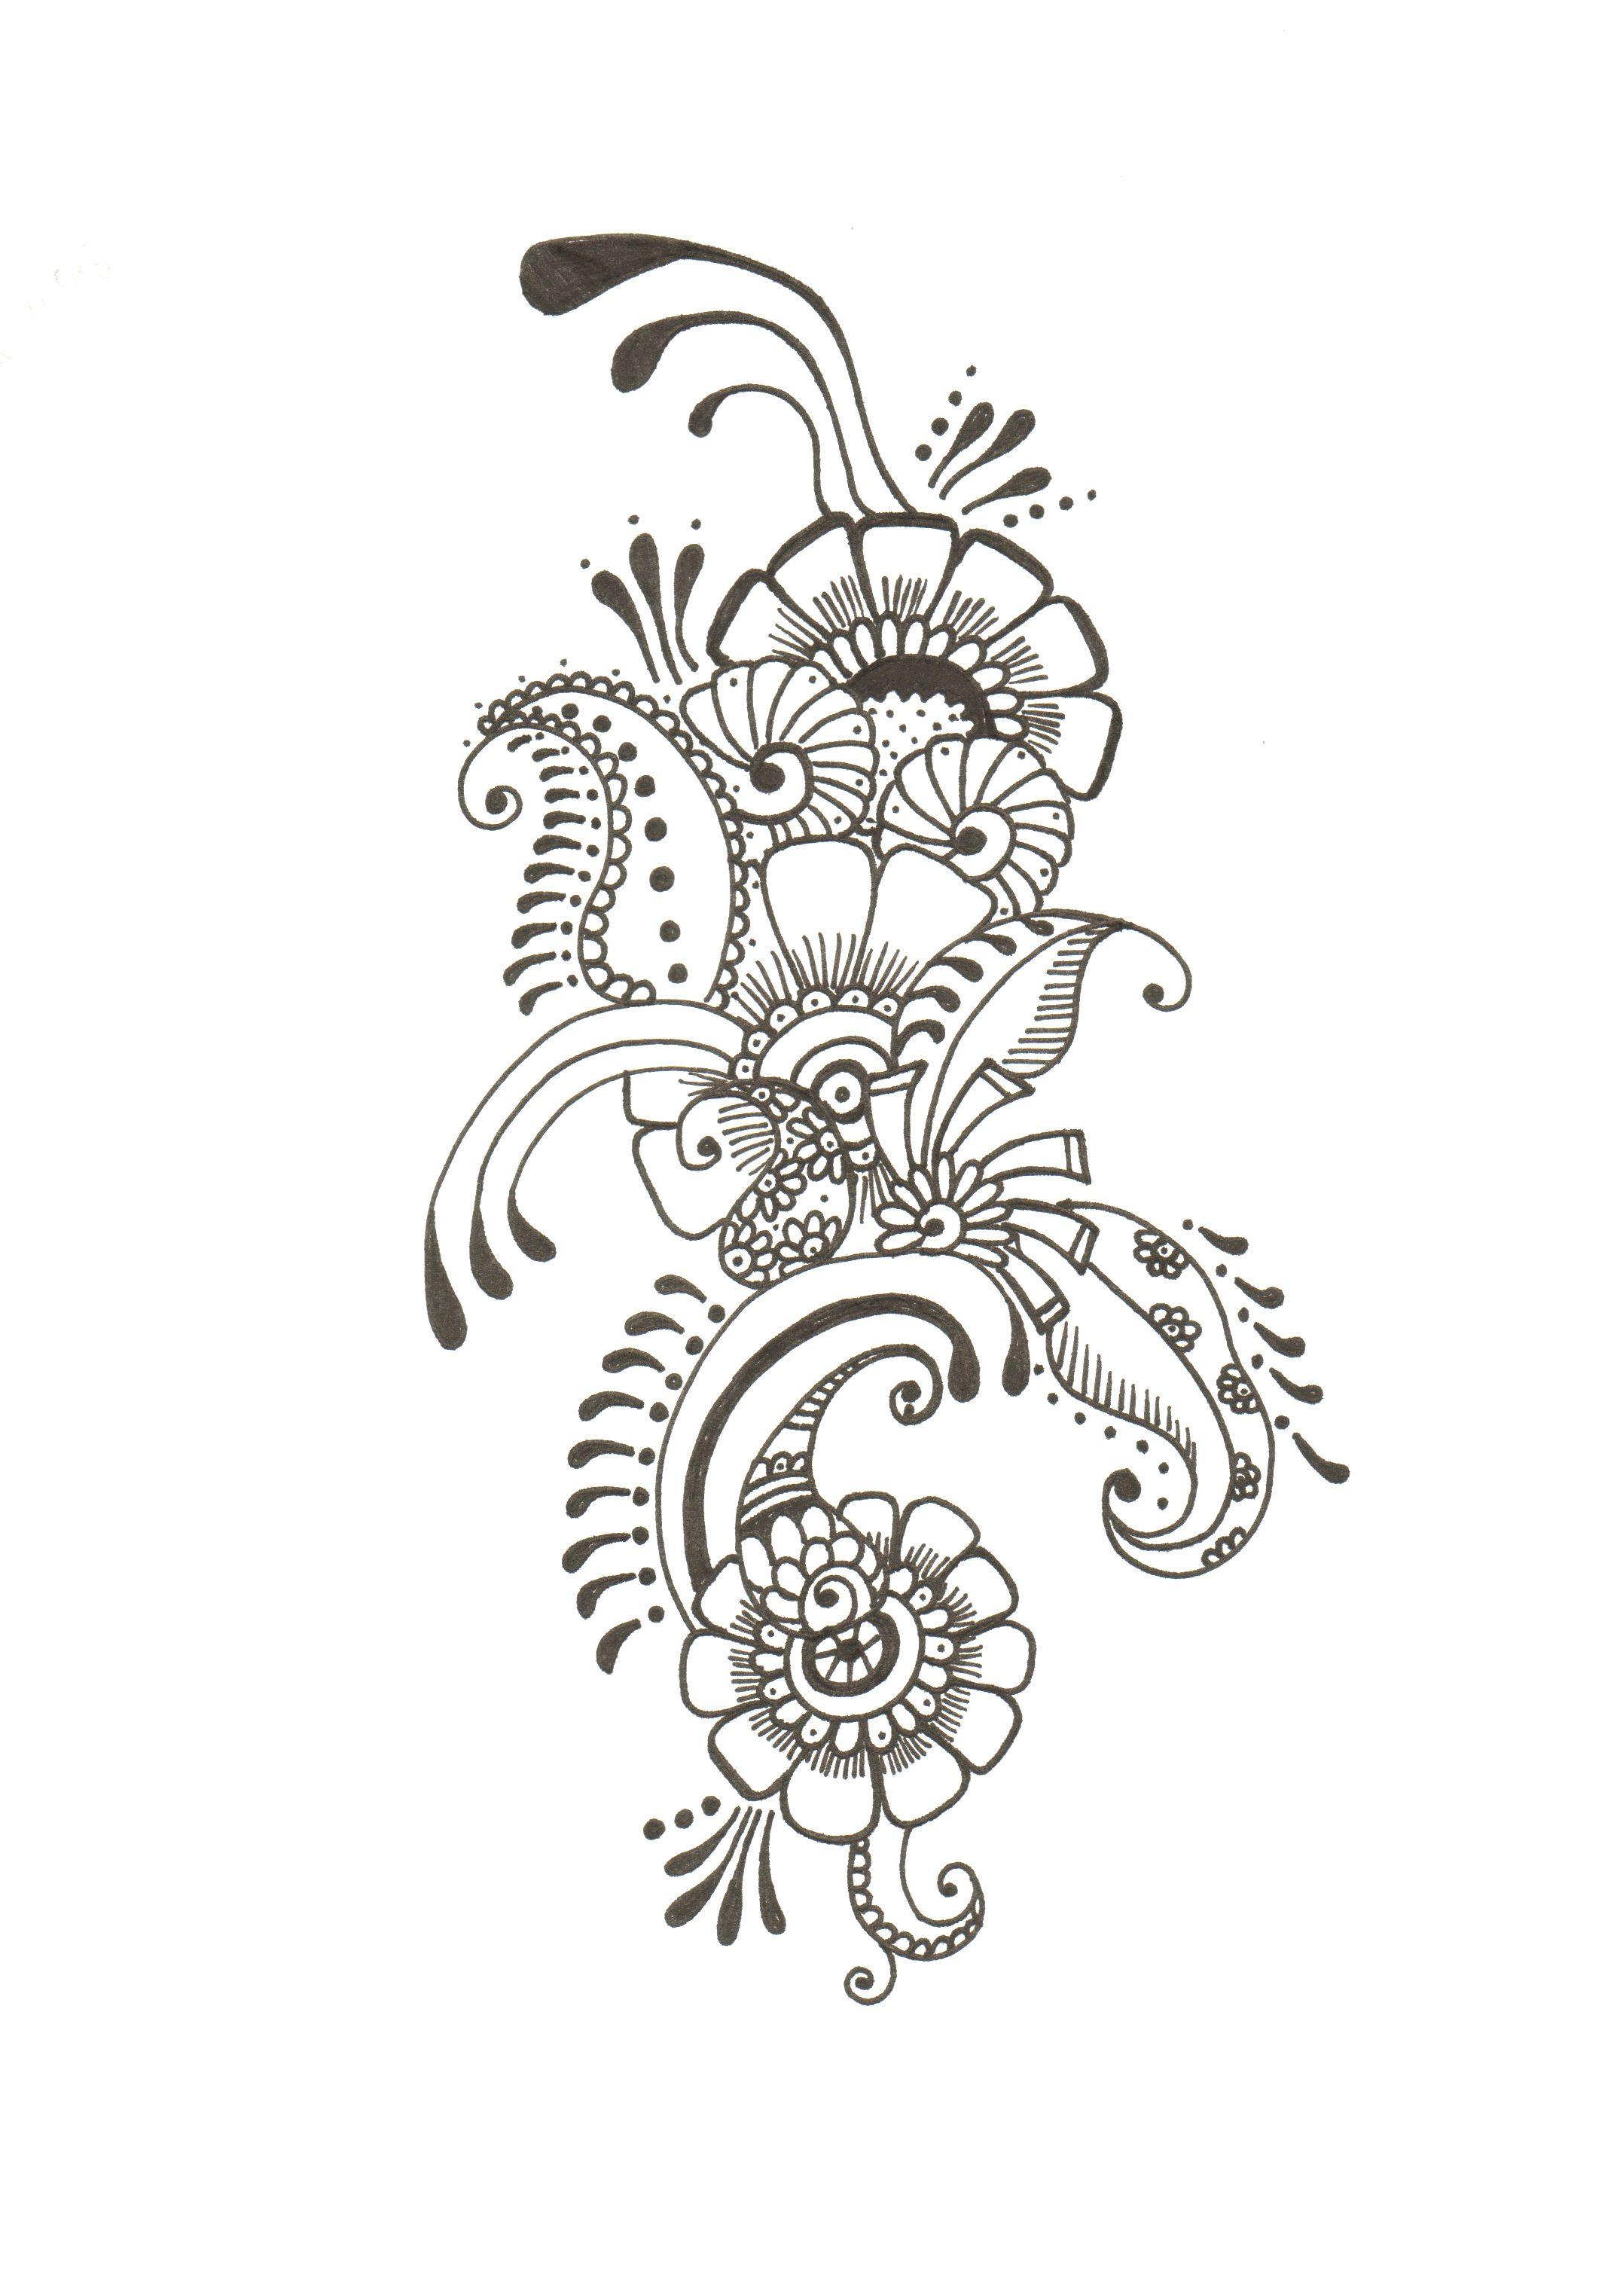 mds00011.jpg 2,151×3,048 pixels | Henna drawings, Flower tattoo ...